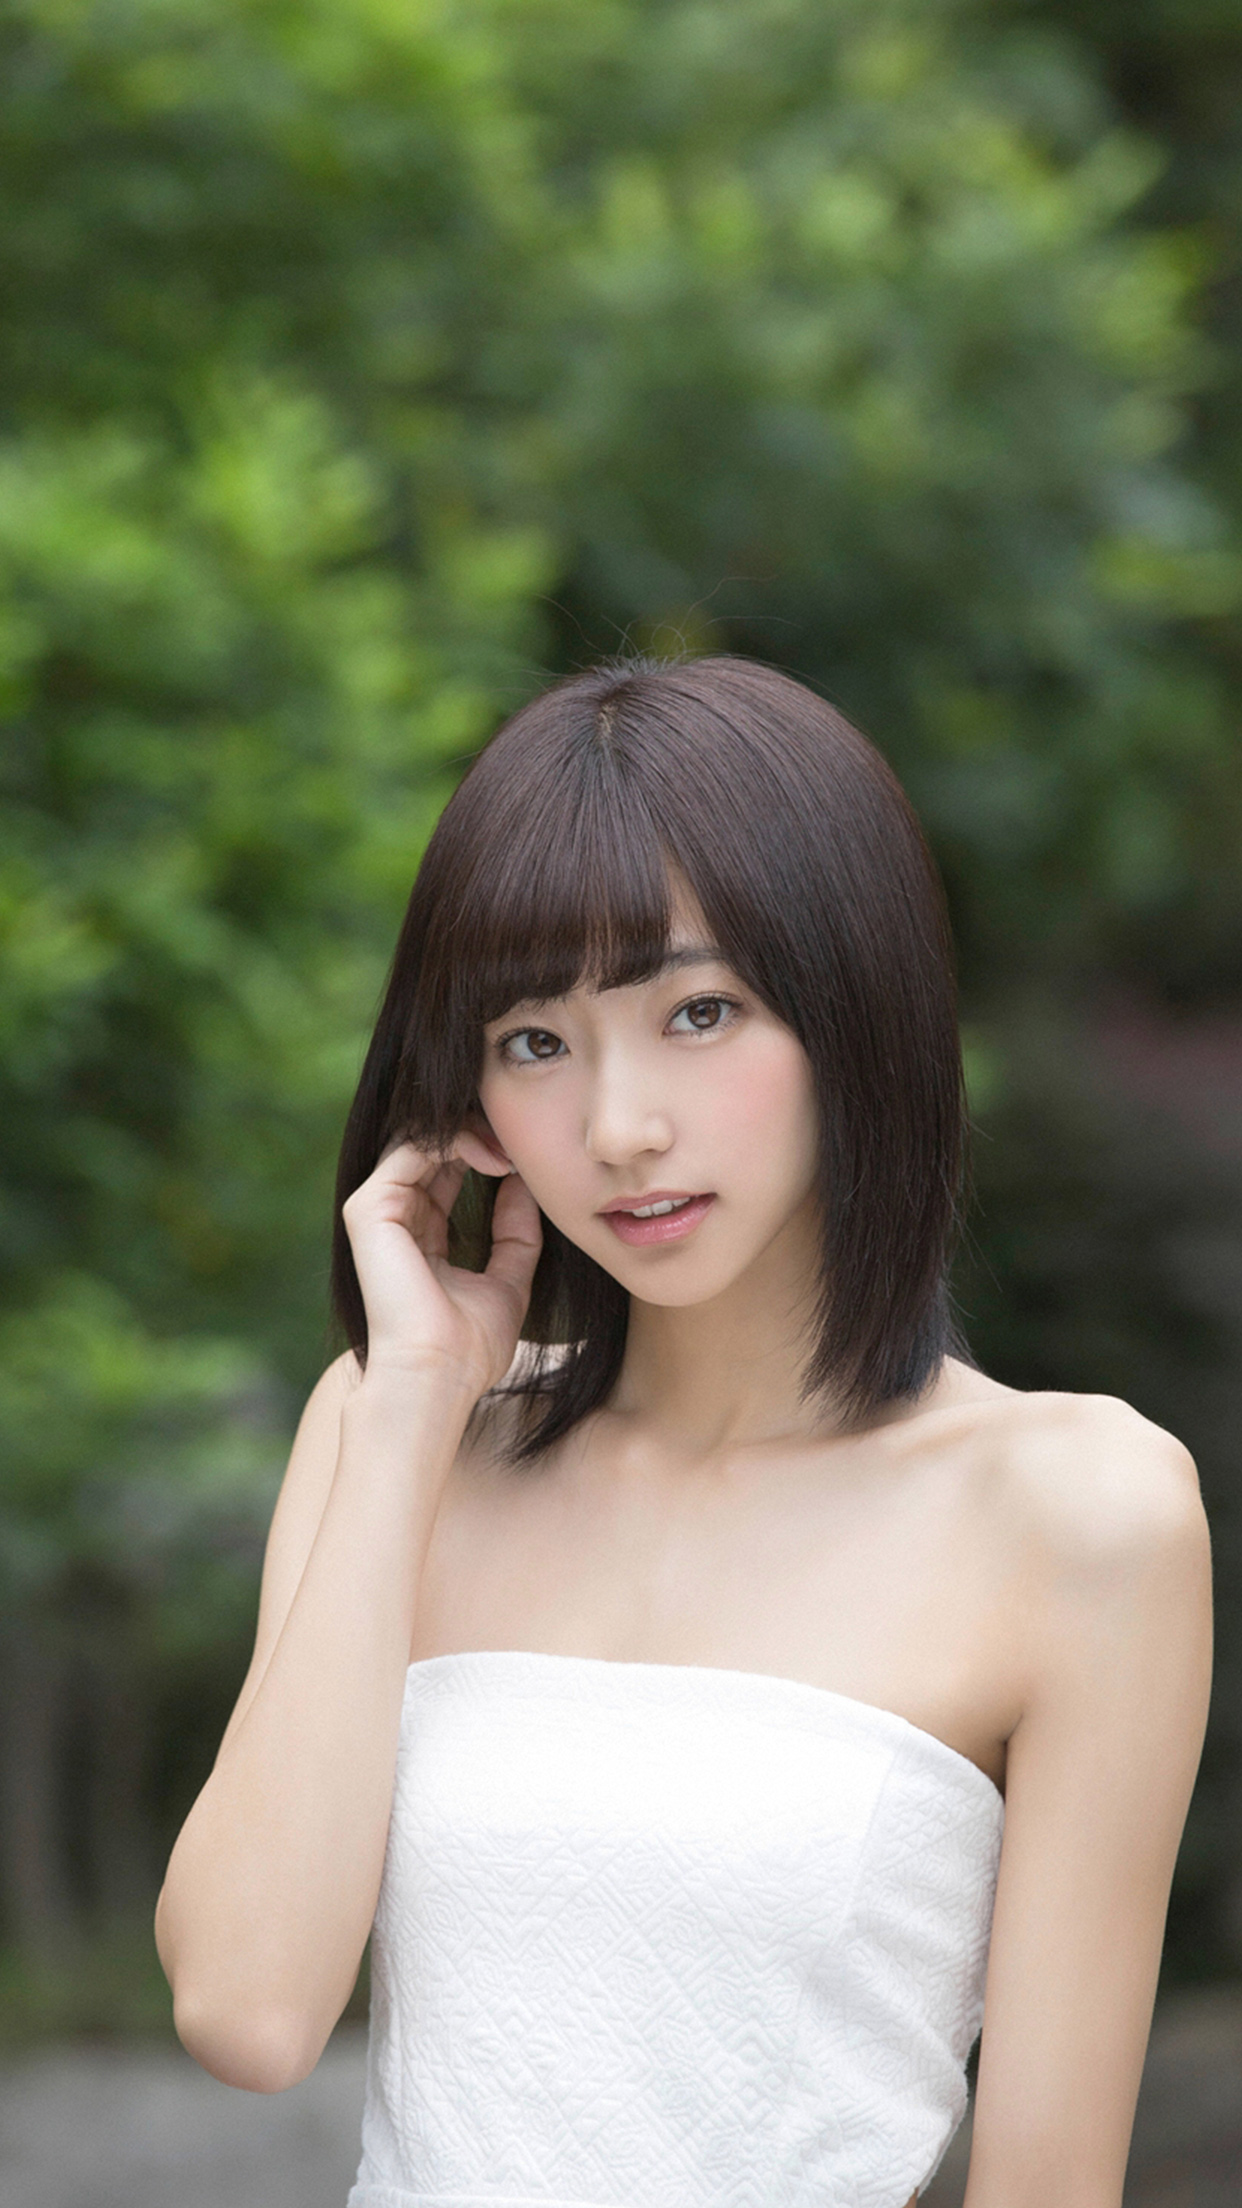 1242 2208 iphone 33 17 blog nobon